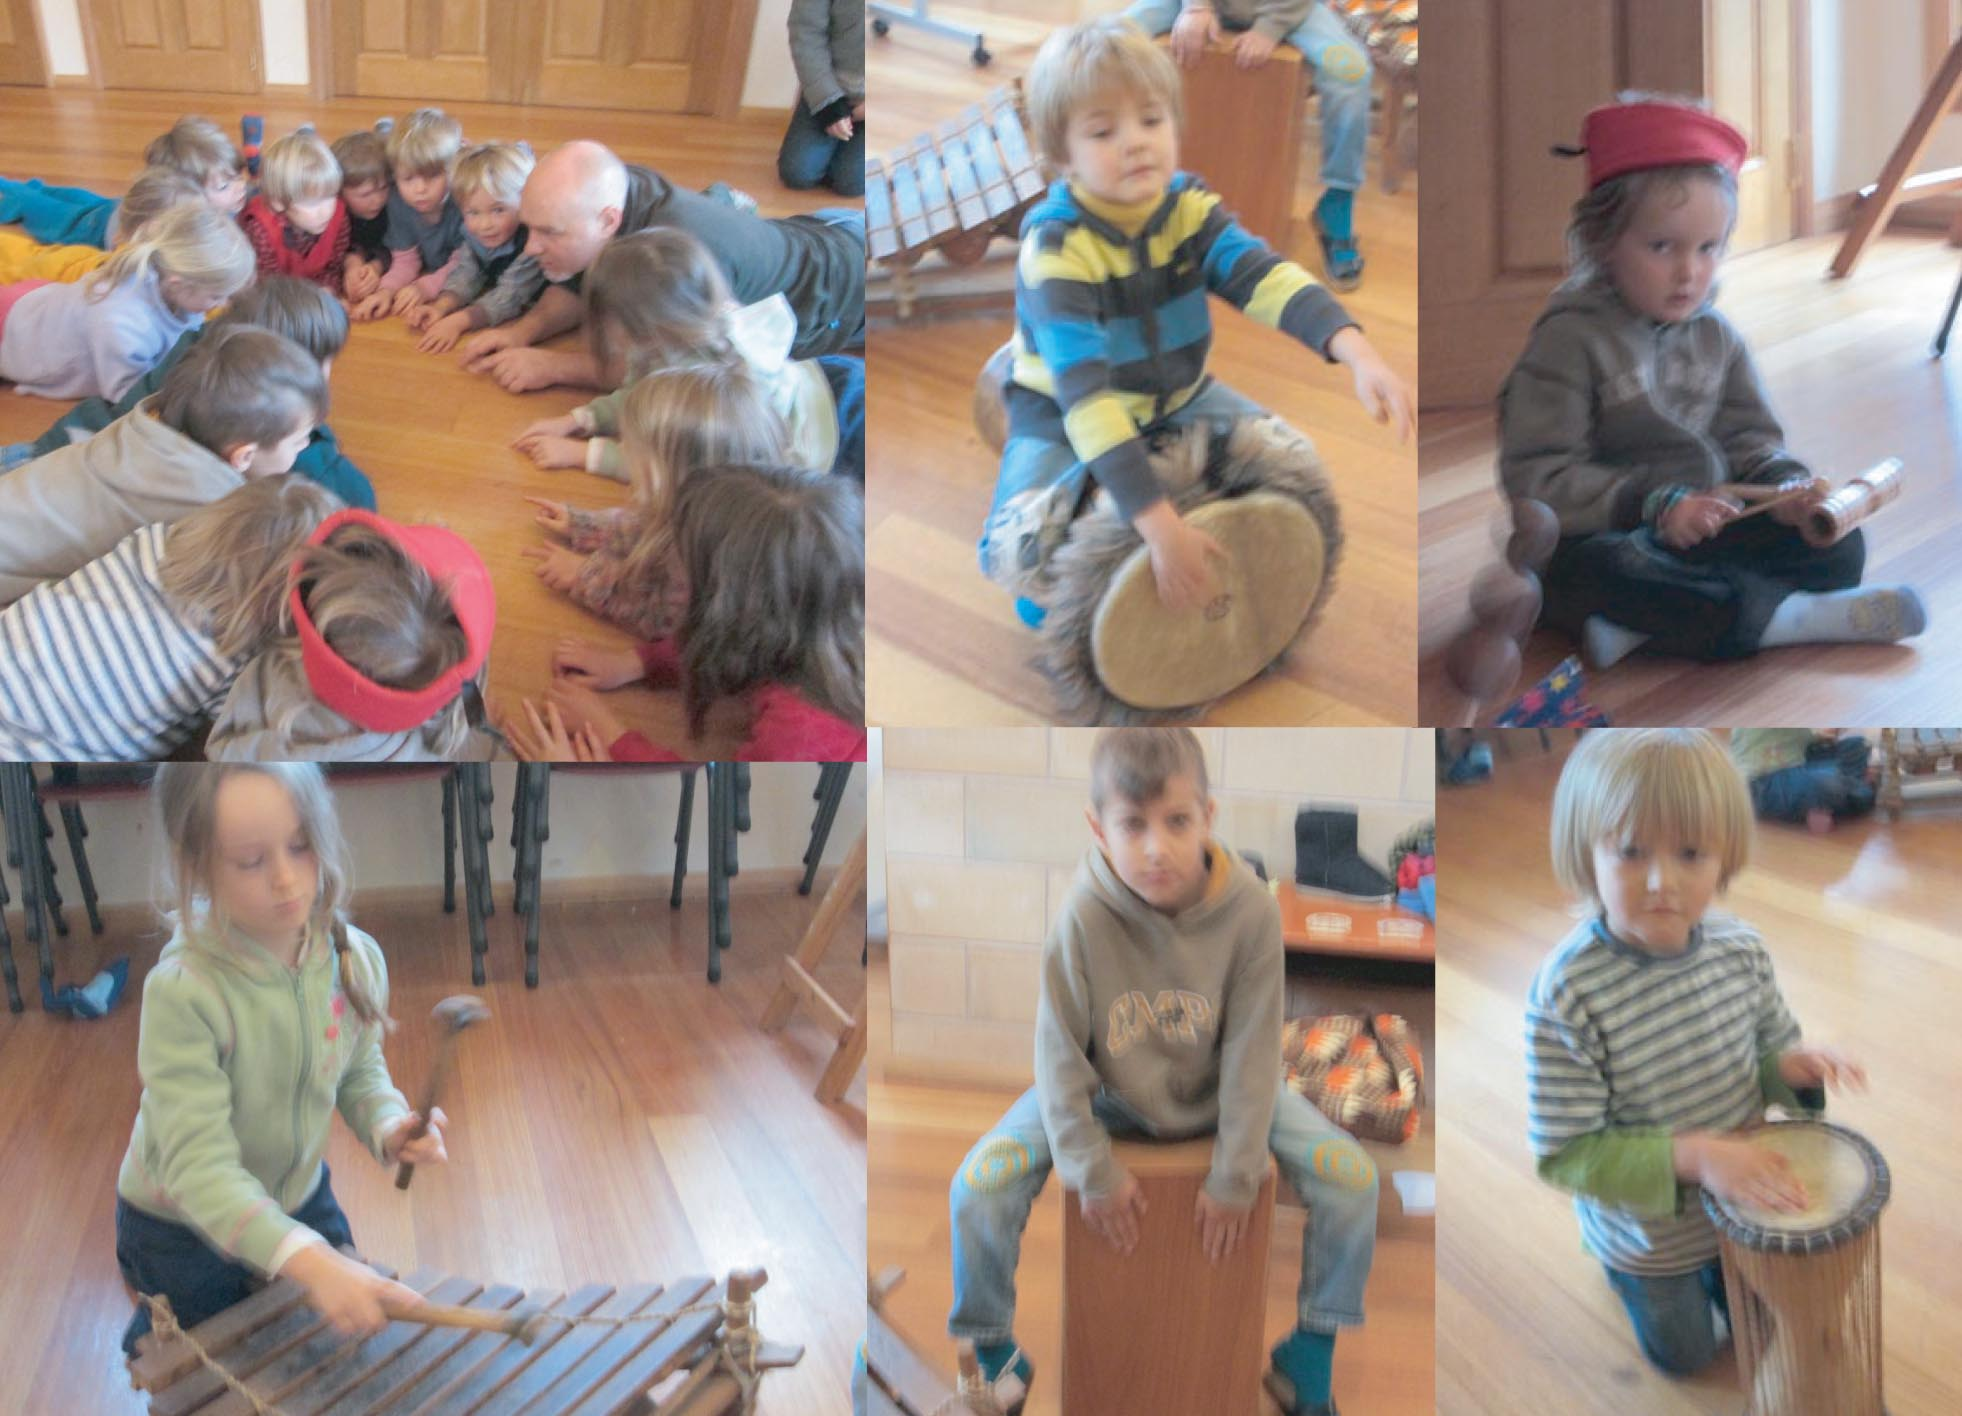 prgne drums montage